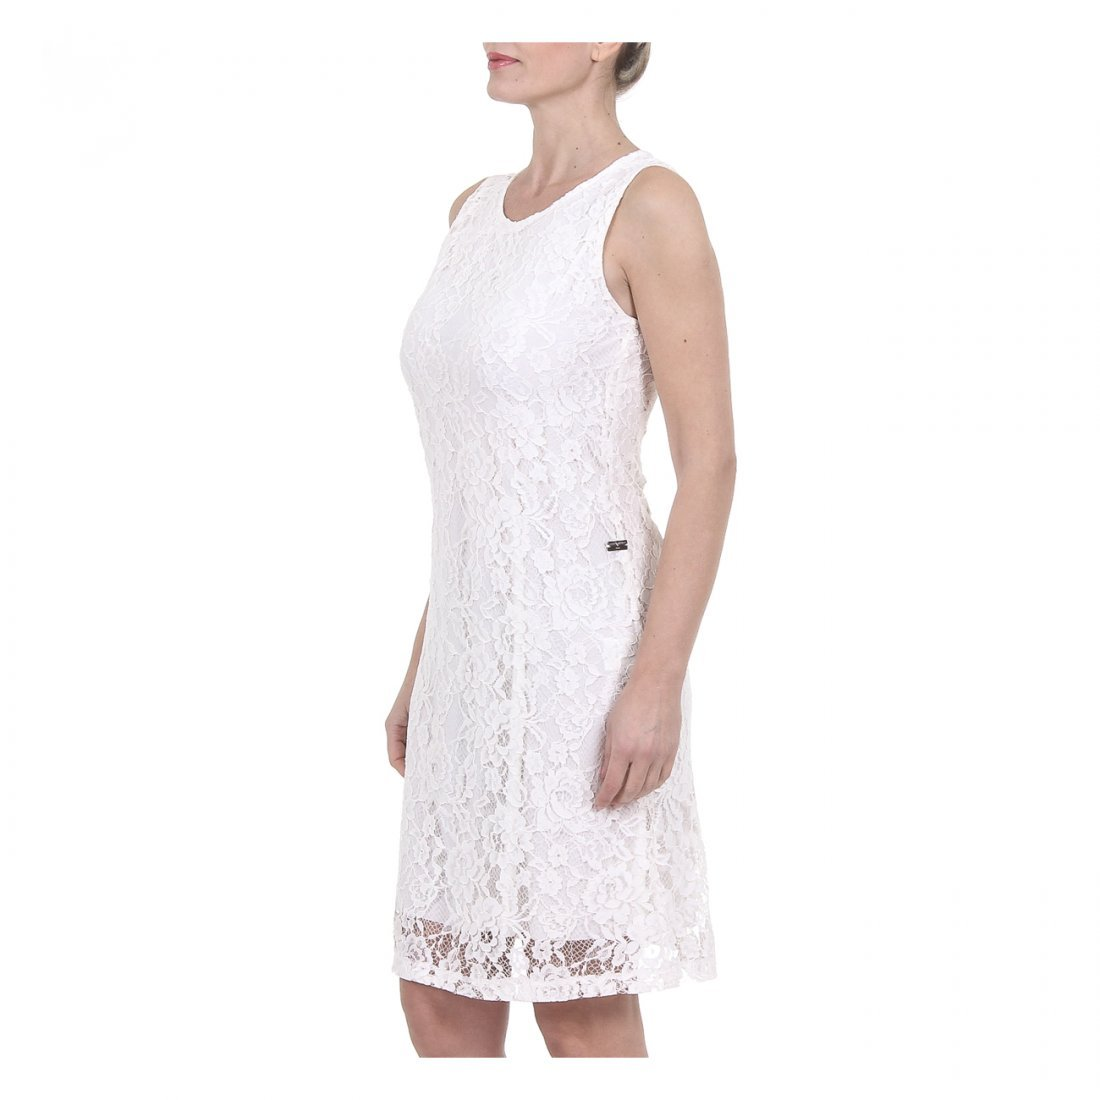 Ladies VERSACE 1969 White Summer Dress - 2